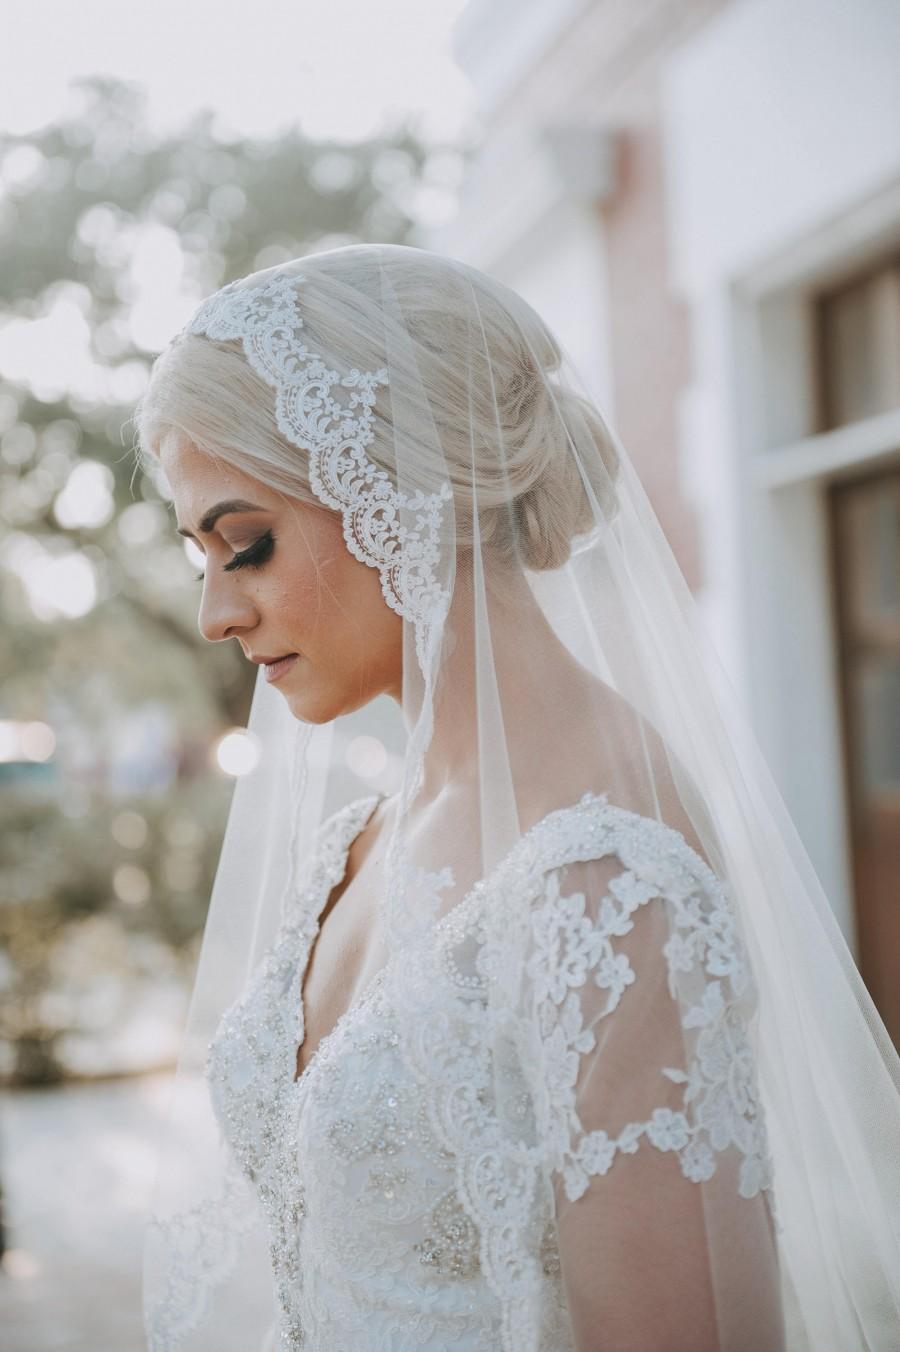 Mariage - Mantilla Lace Wedding Veil